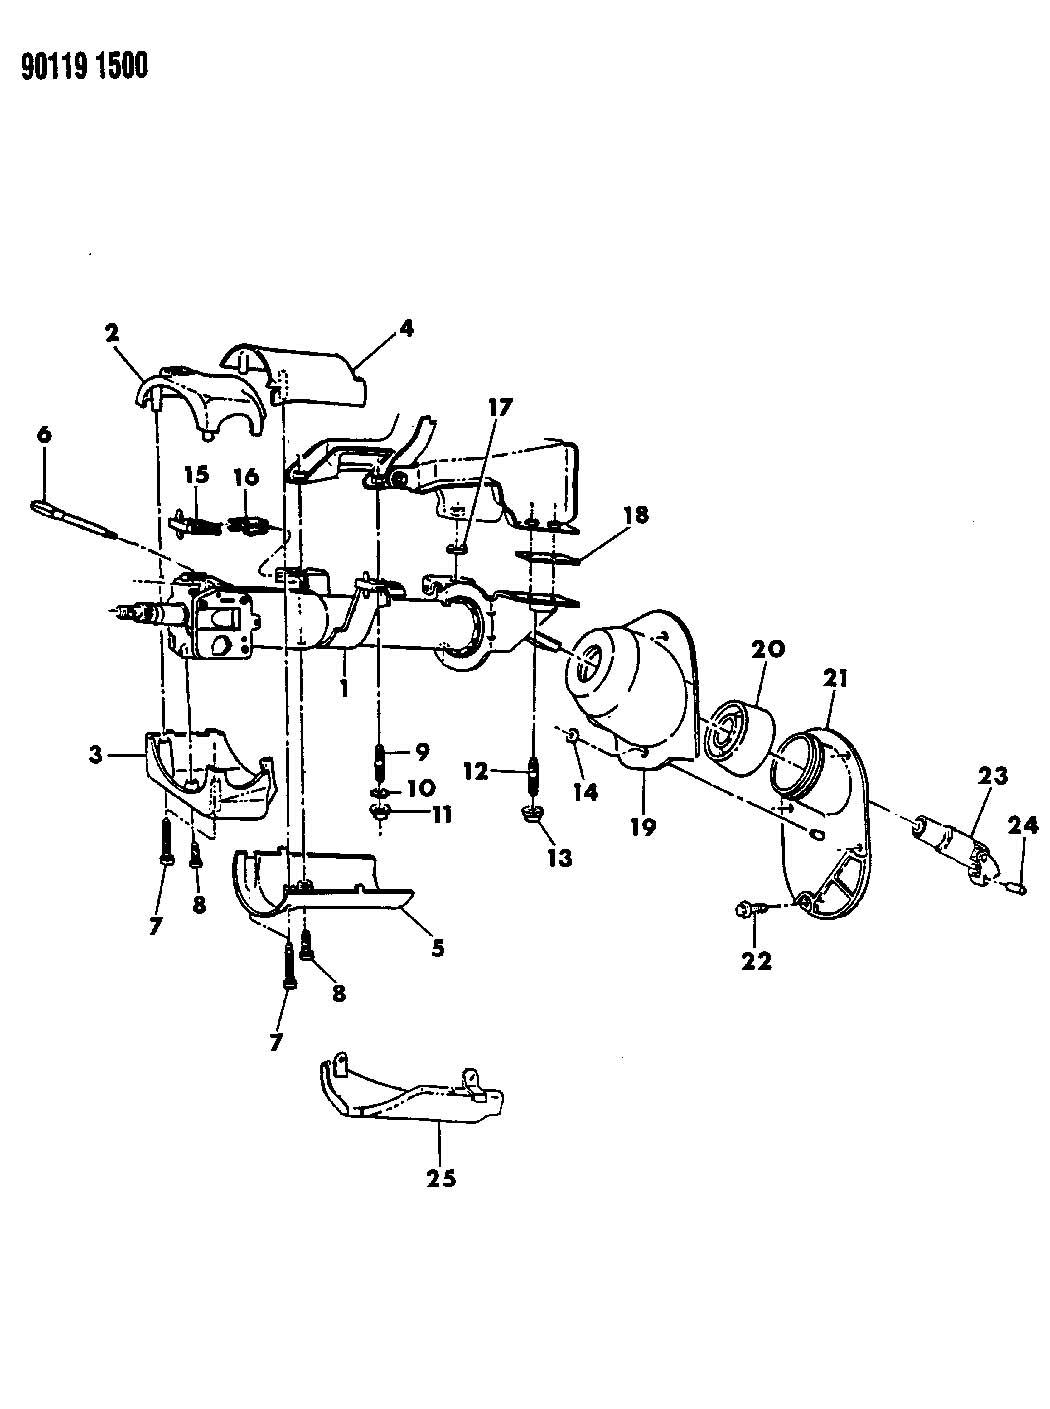 Service manual [1992 Plymouth Laser Tilt Steering Column